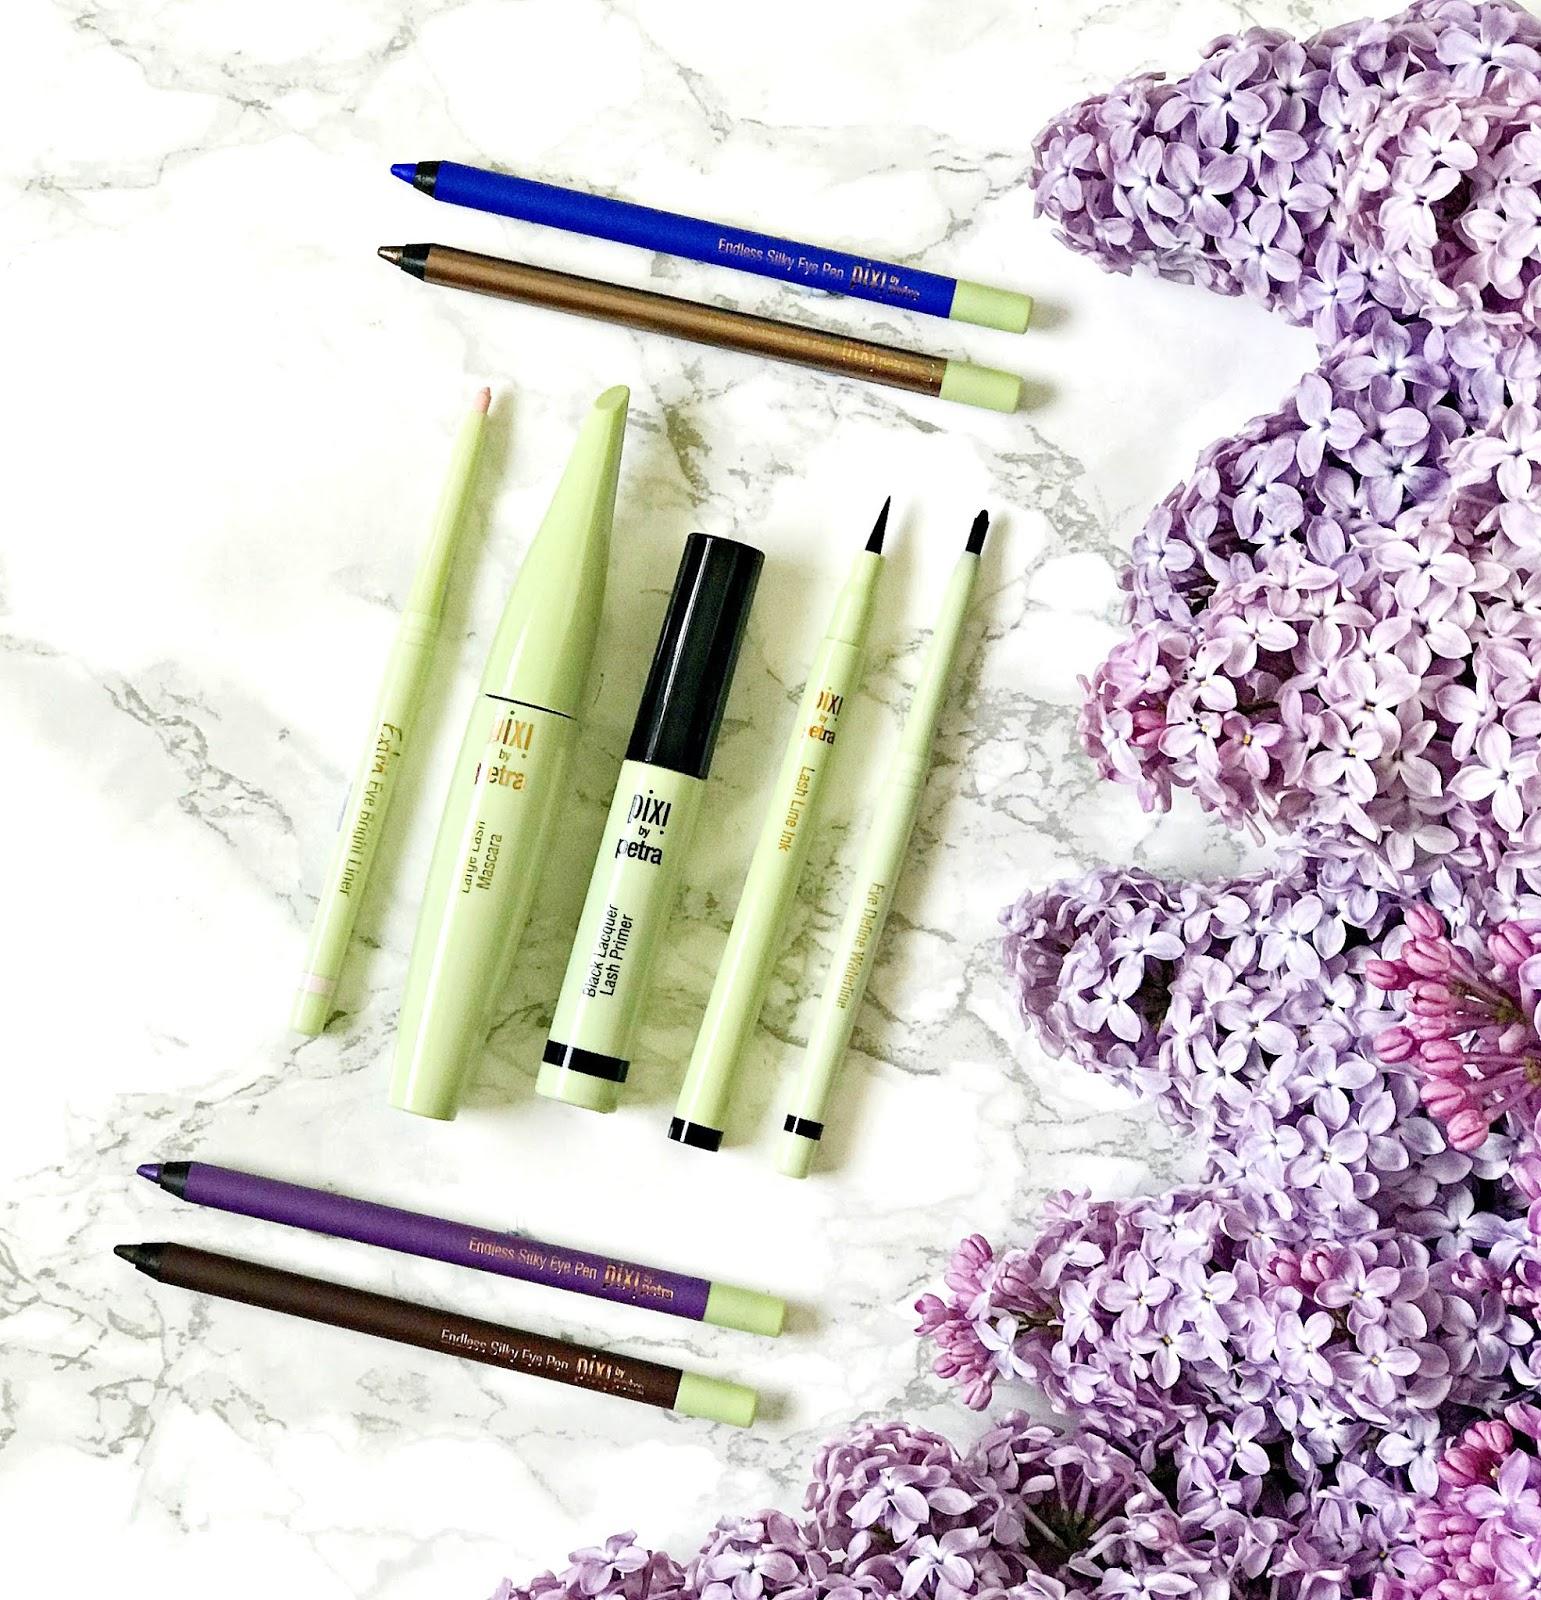 Pixi, Lash Primer, Large Lash Mascara, Extra Eye Brightener, Eye Define Waterline, Endless Silky Eye Pen, Lash Line Ink, Review